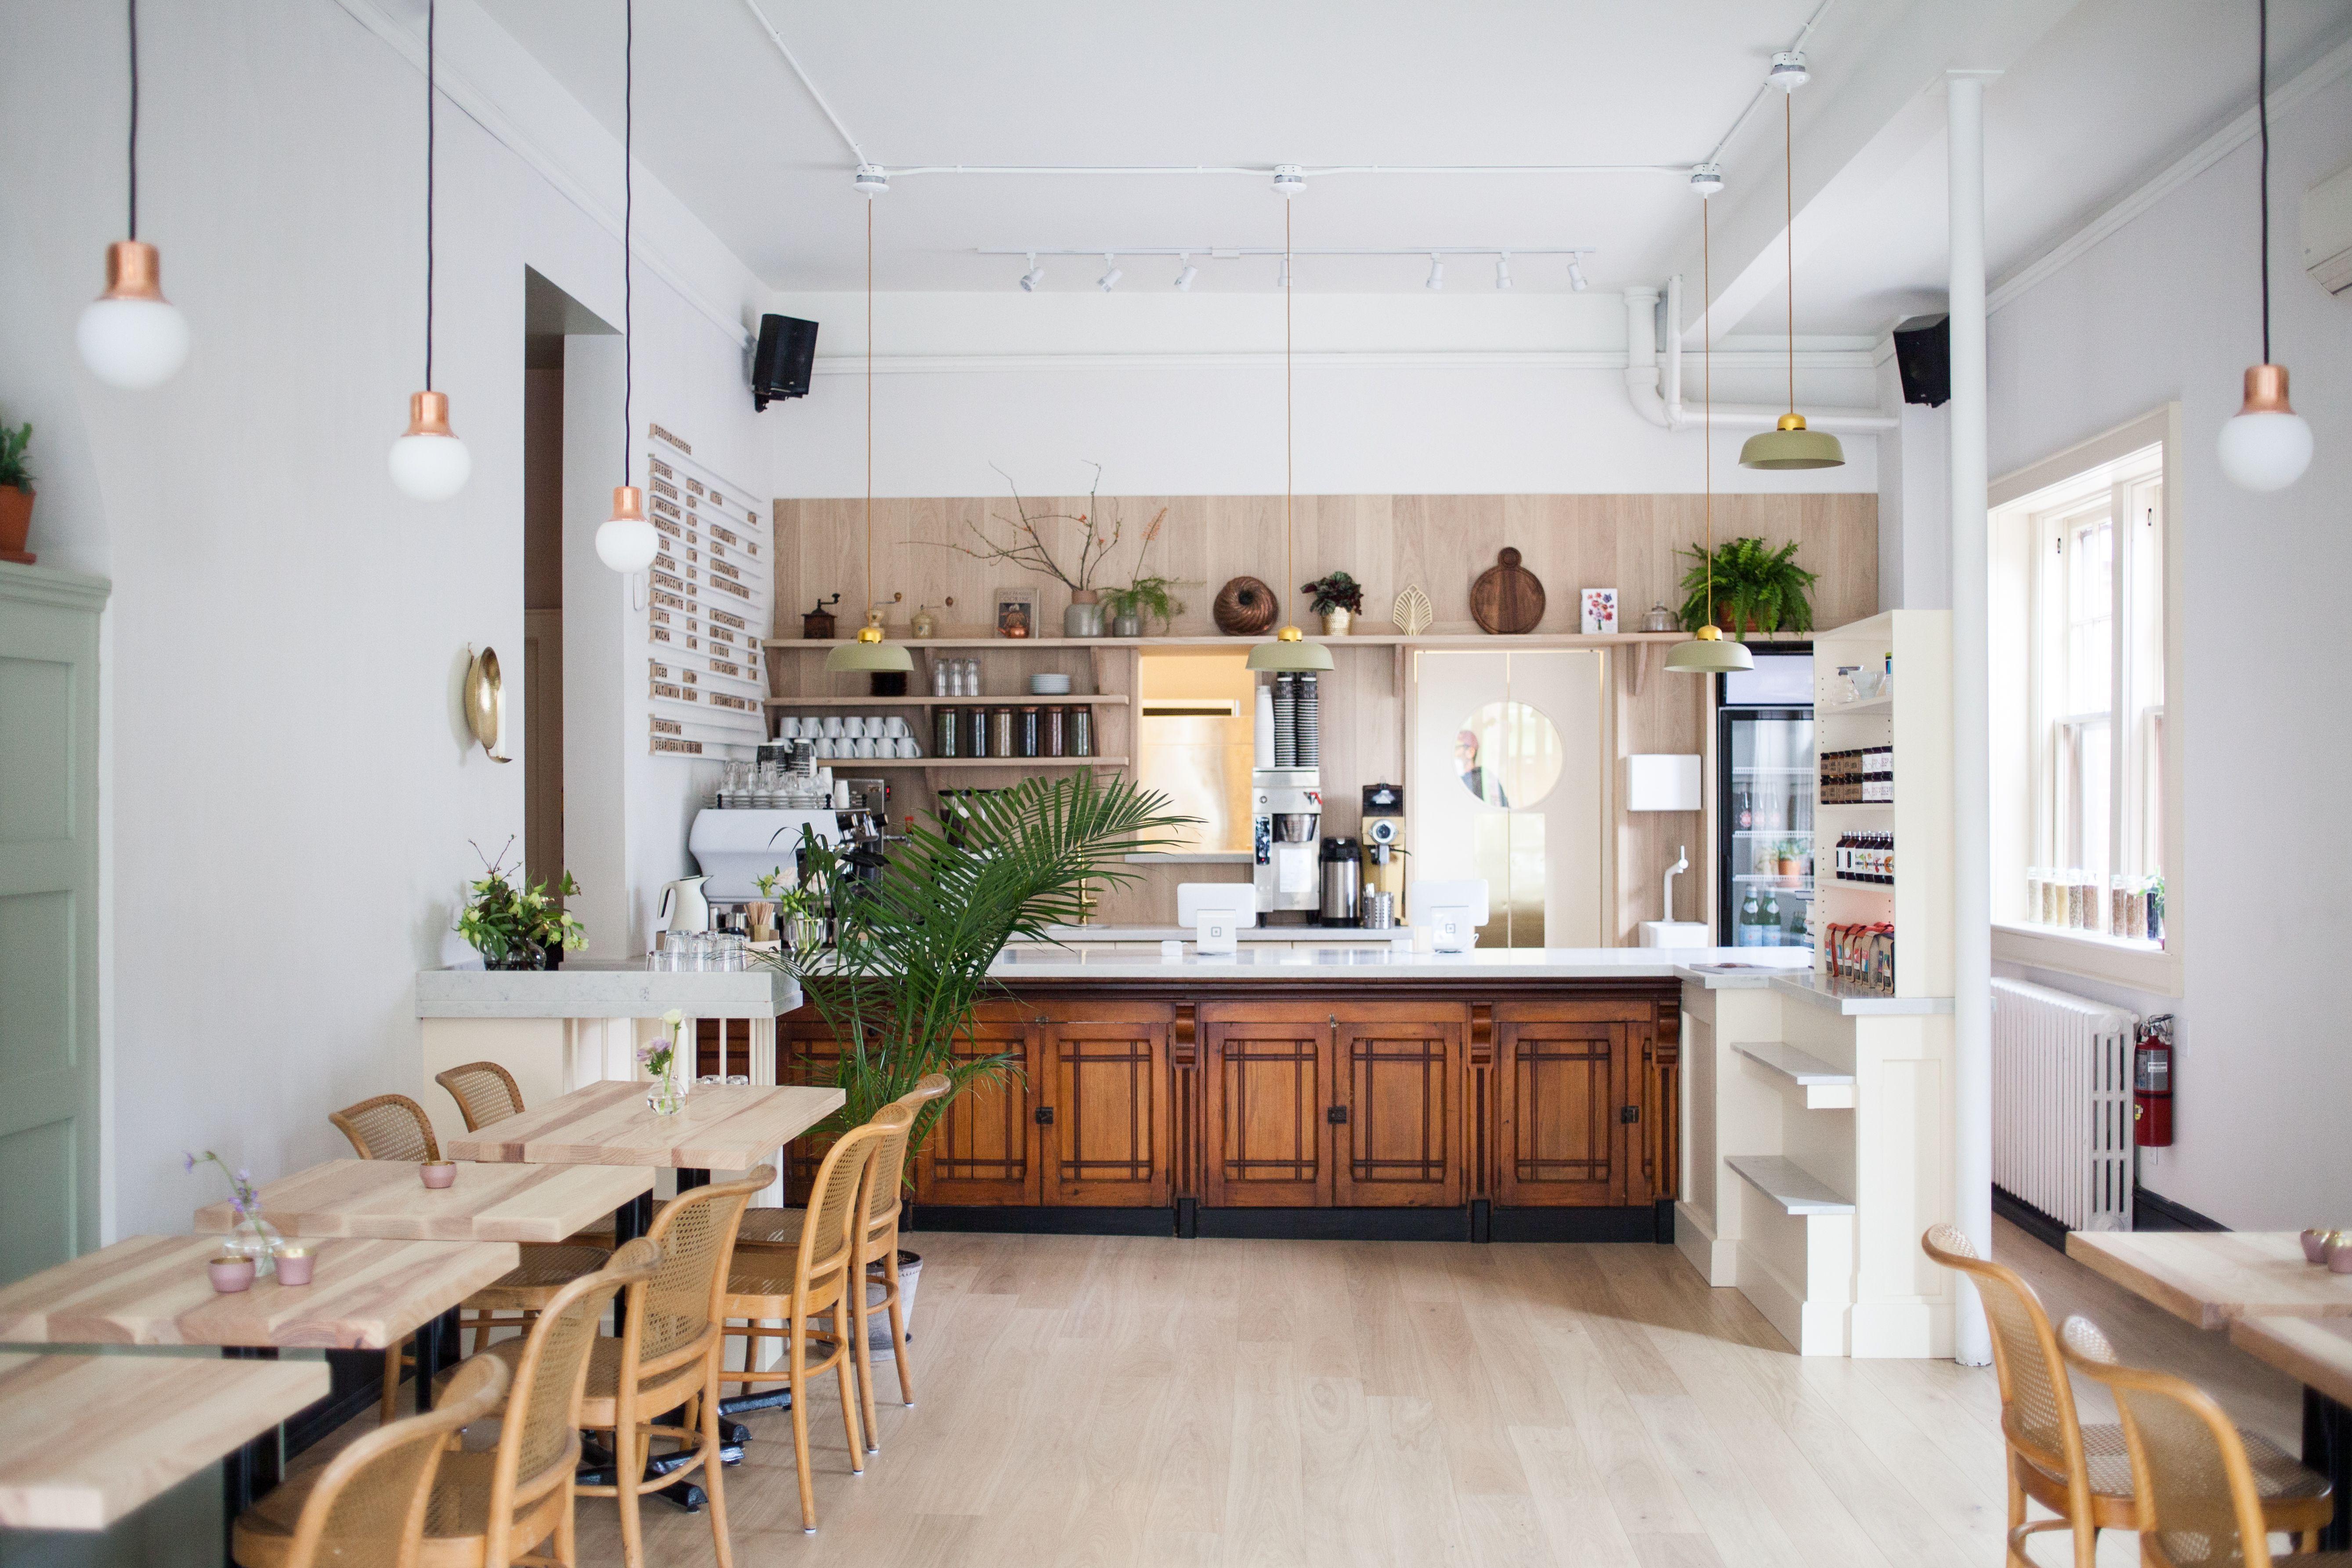 Our Favorite Scandi Design Spots Around The World Scandi Design Cafe Interior Scandi Interiors